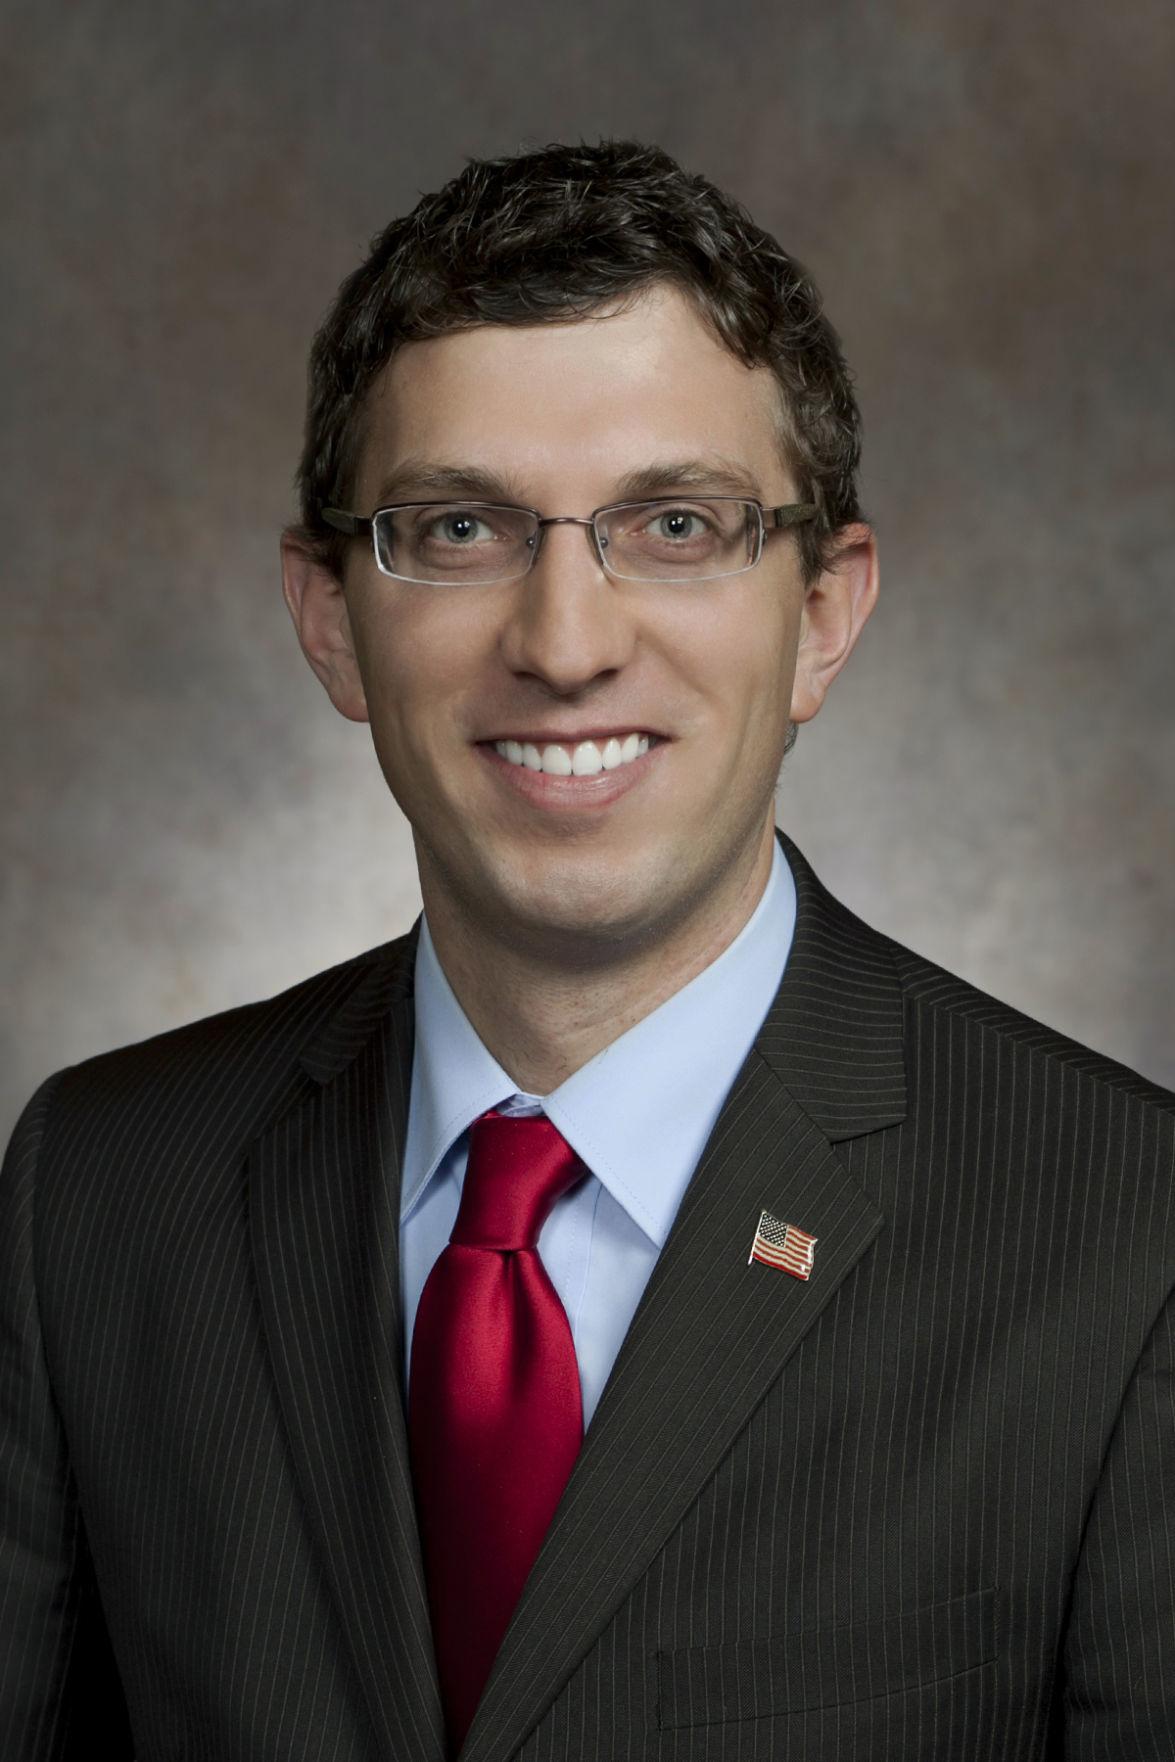 Travis Tranel